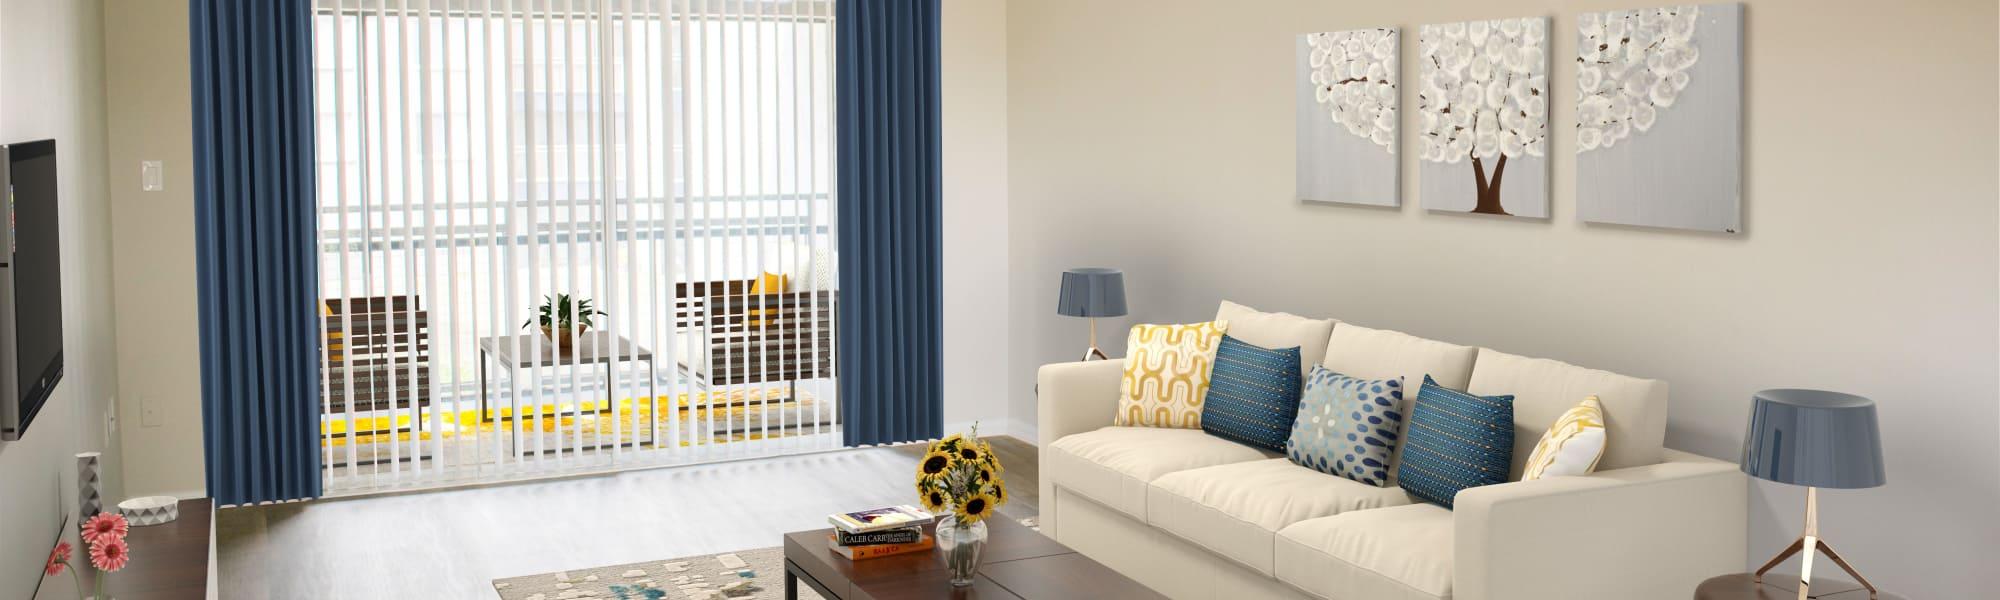 Cozy living room at Promenade at Edgewater in Dunedin